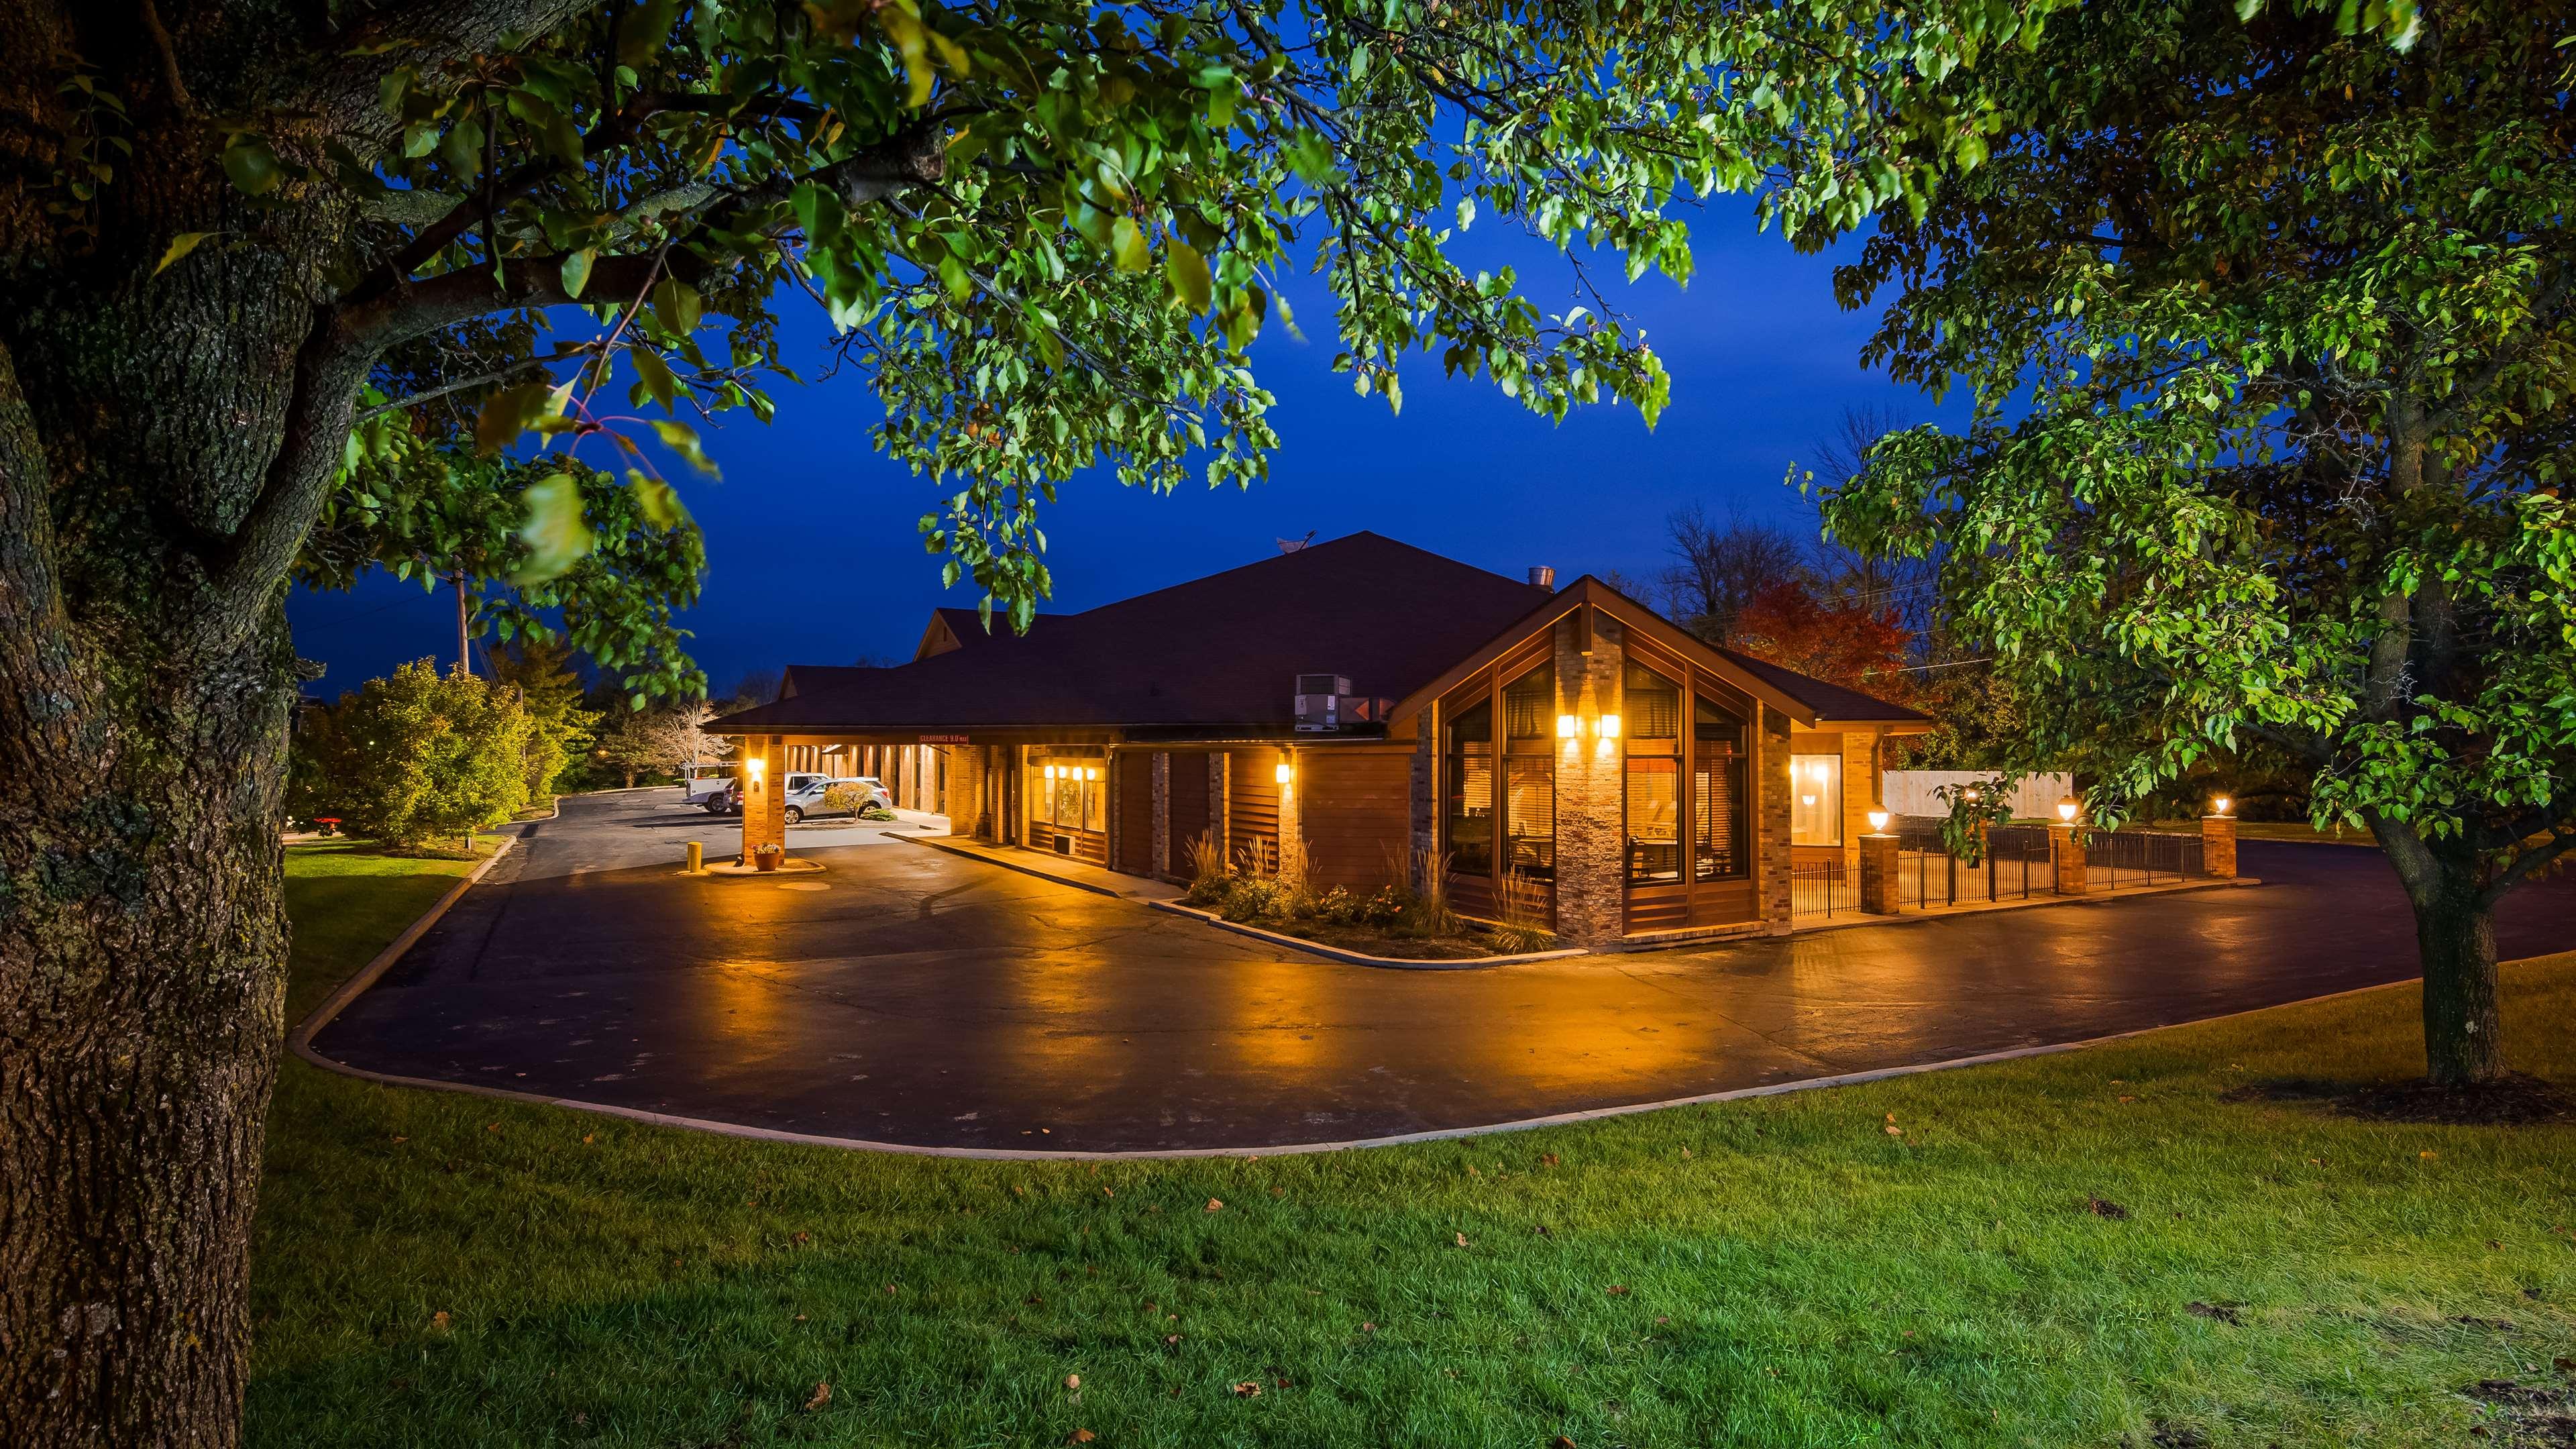 Best Western Sycamore Inn image 2